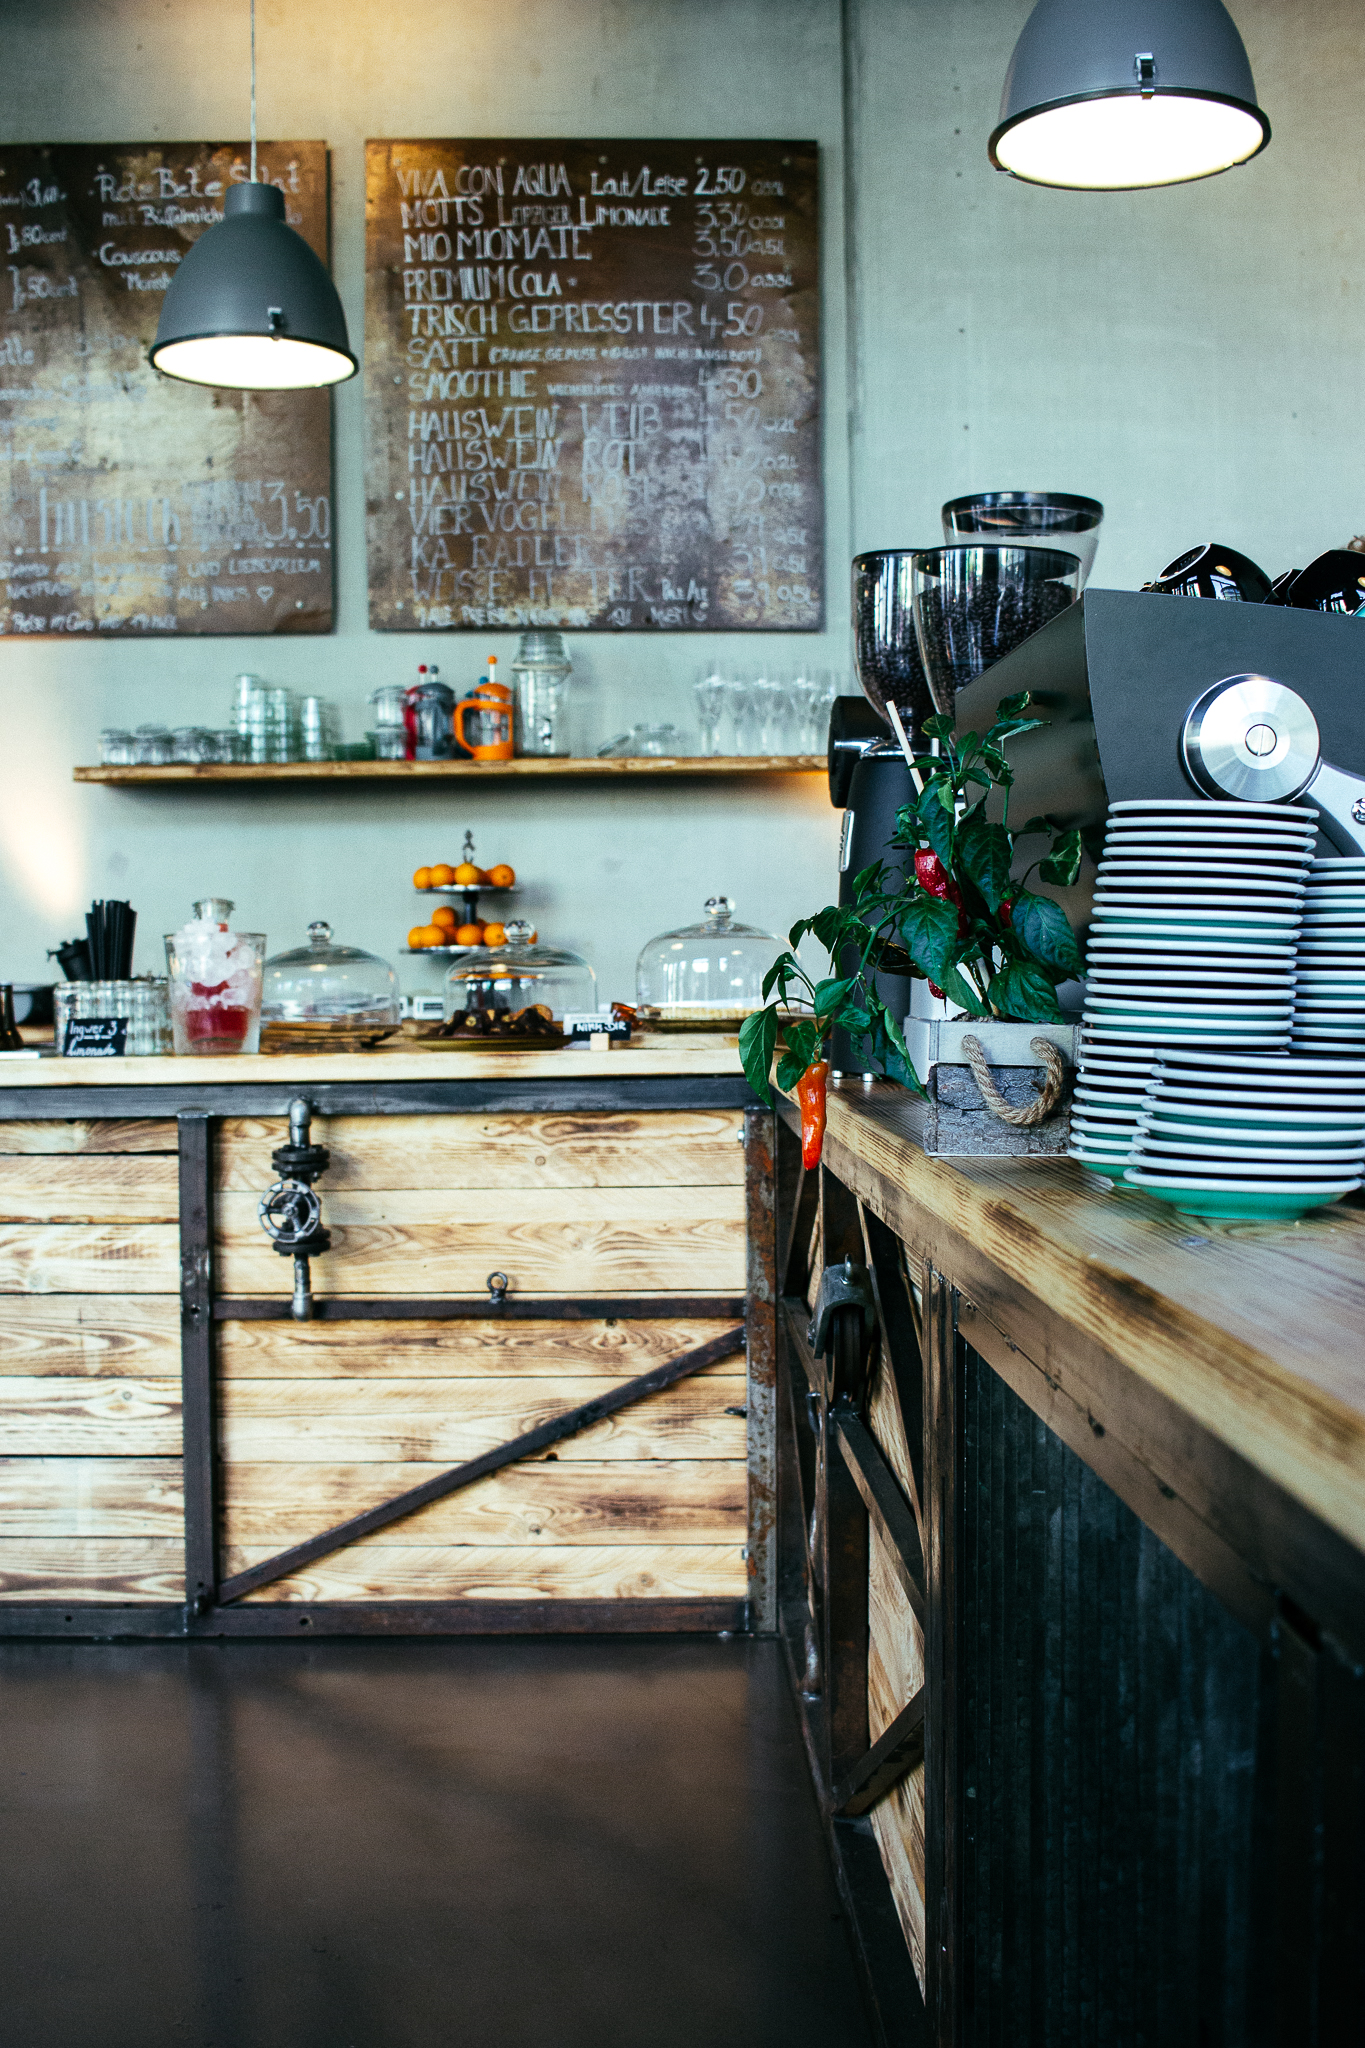 _MG_4532franz morish_kaffeehaus